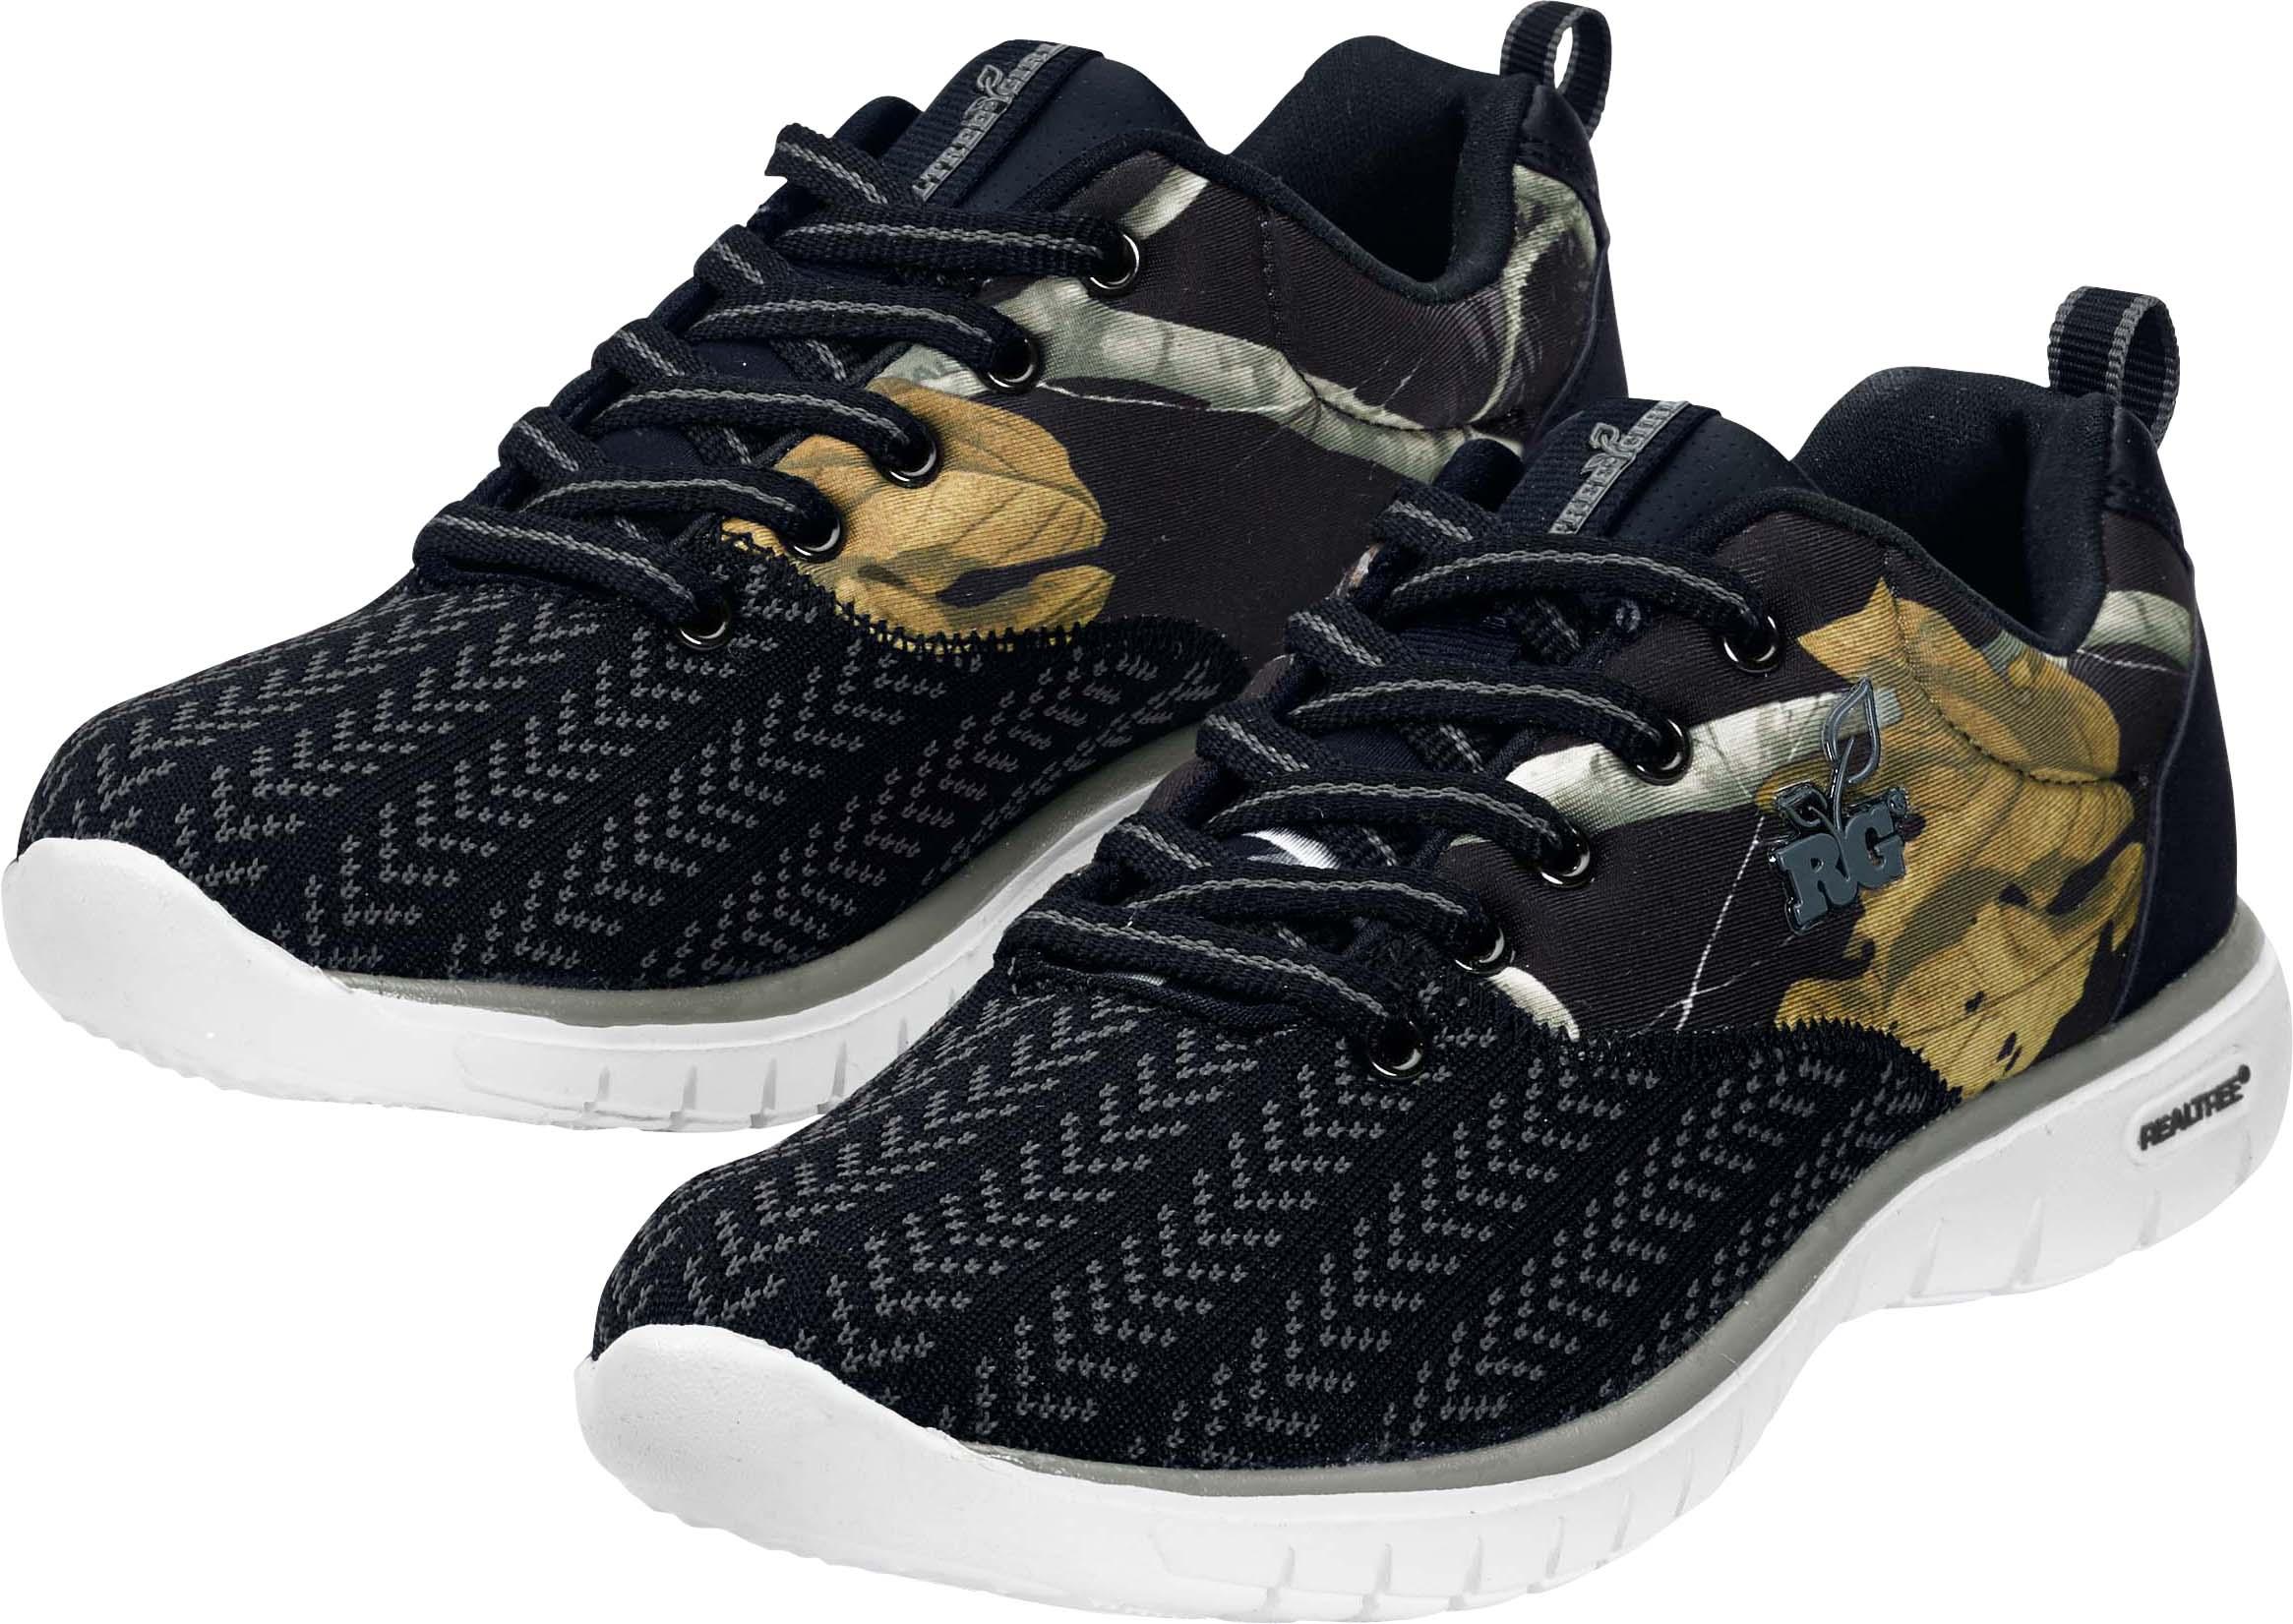 66e5f49b0d543 Women's Realtree Camo Lisa Athletic Shoes | Legendary Whitetails